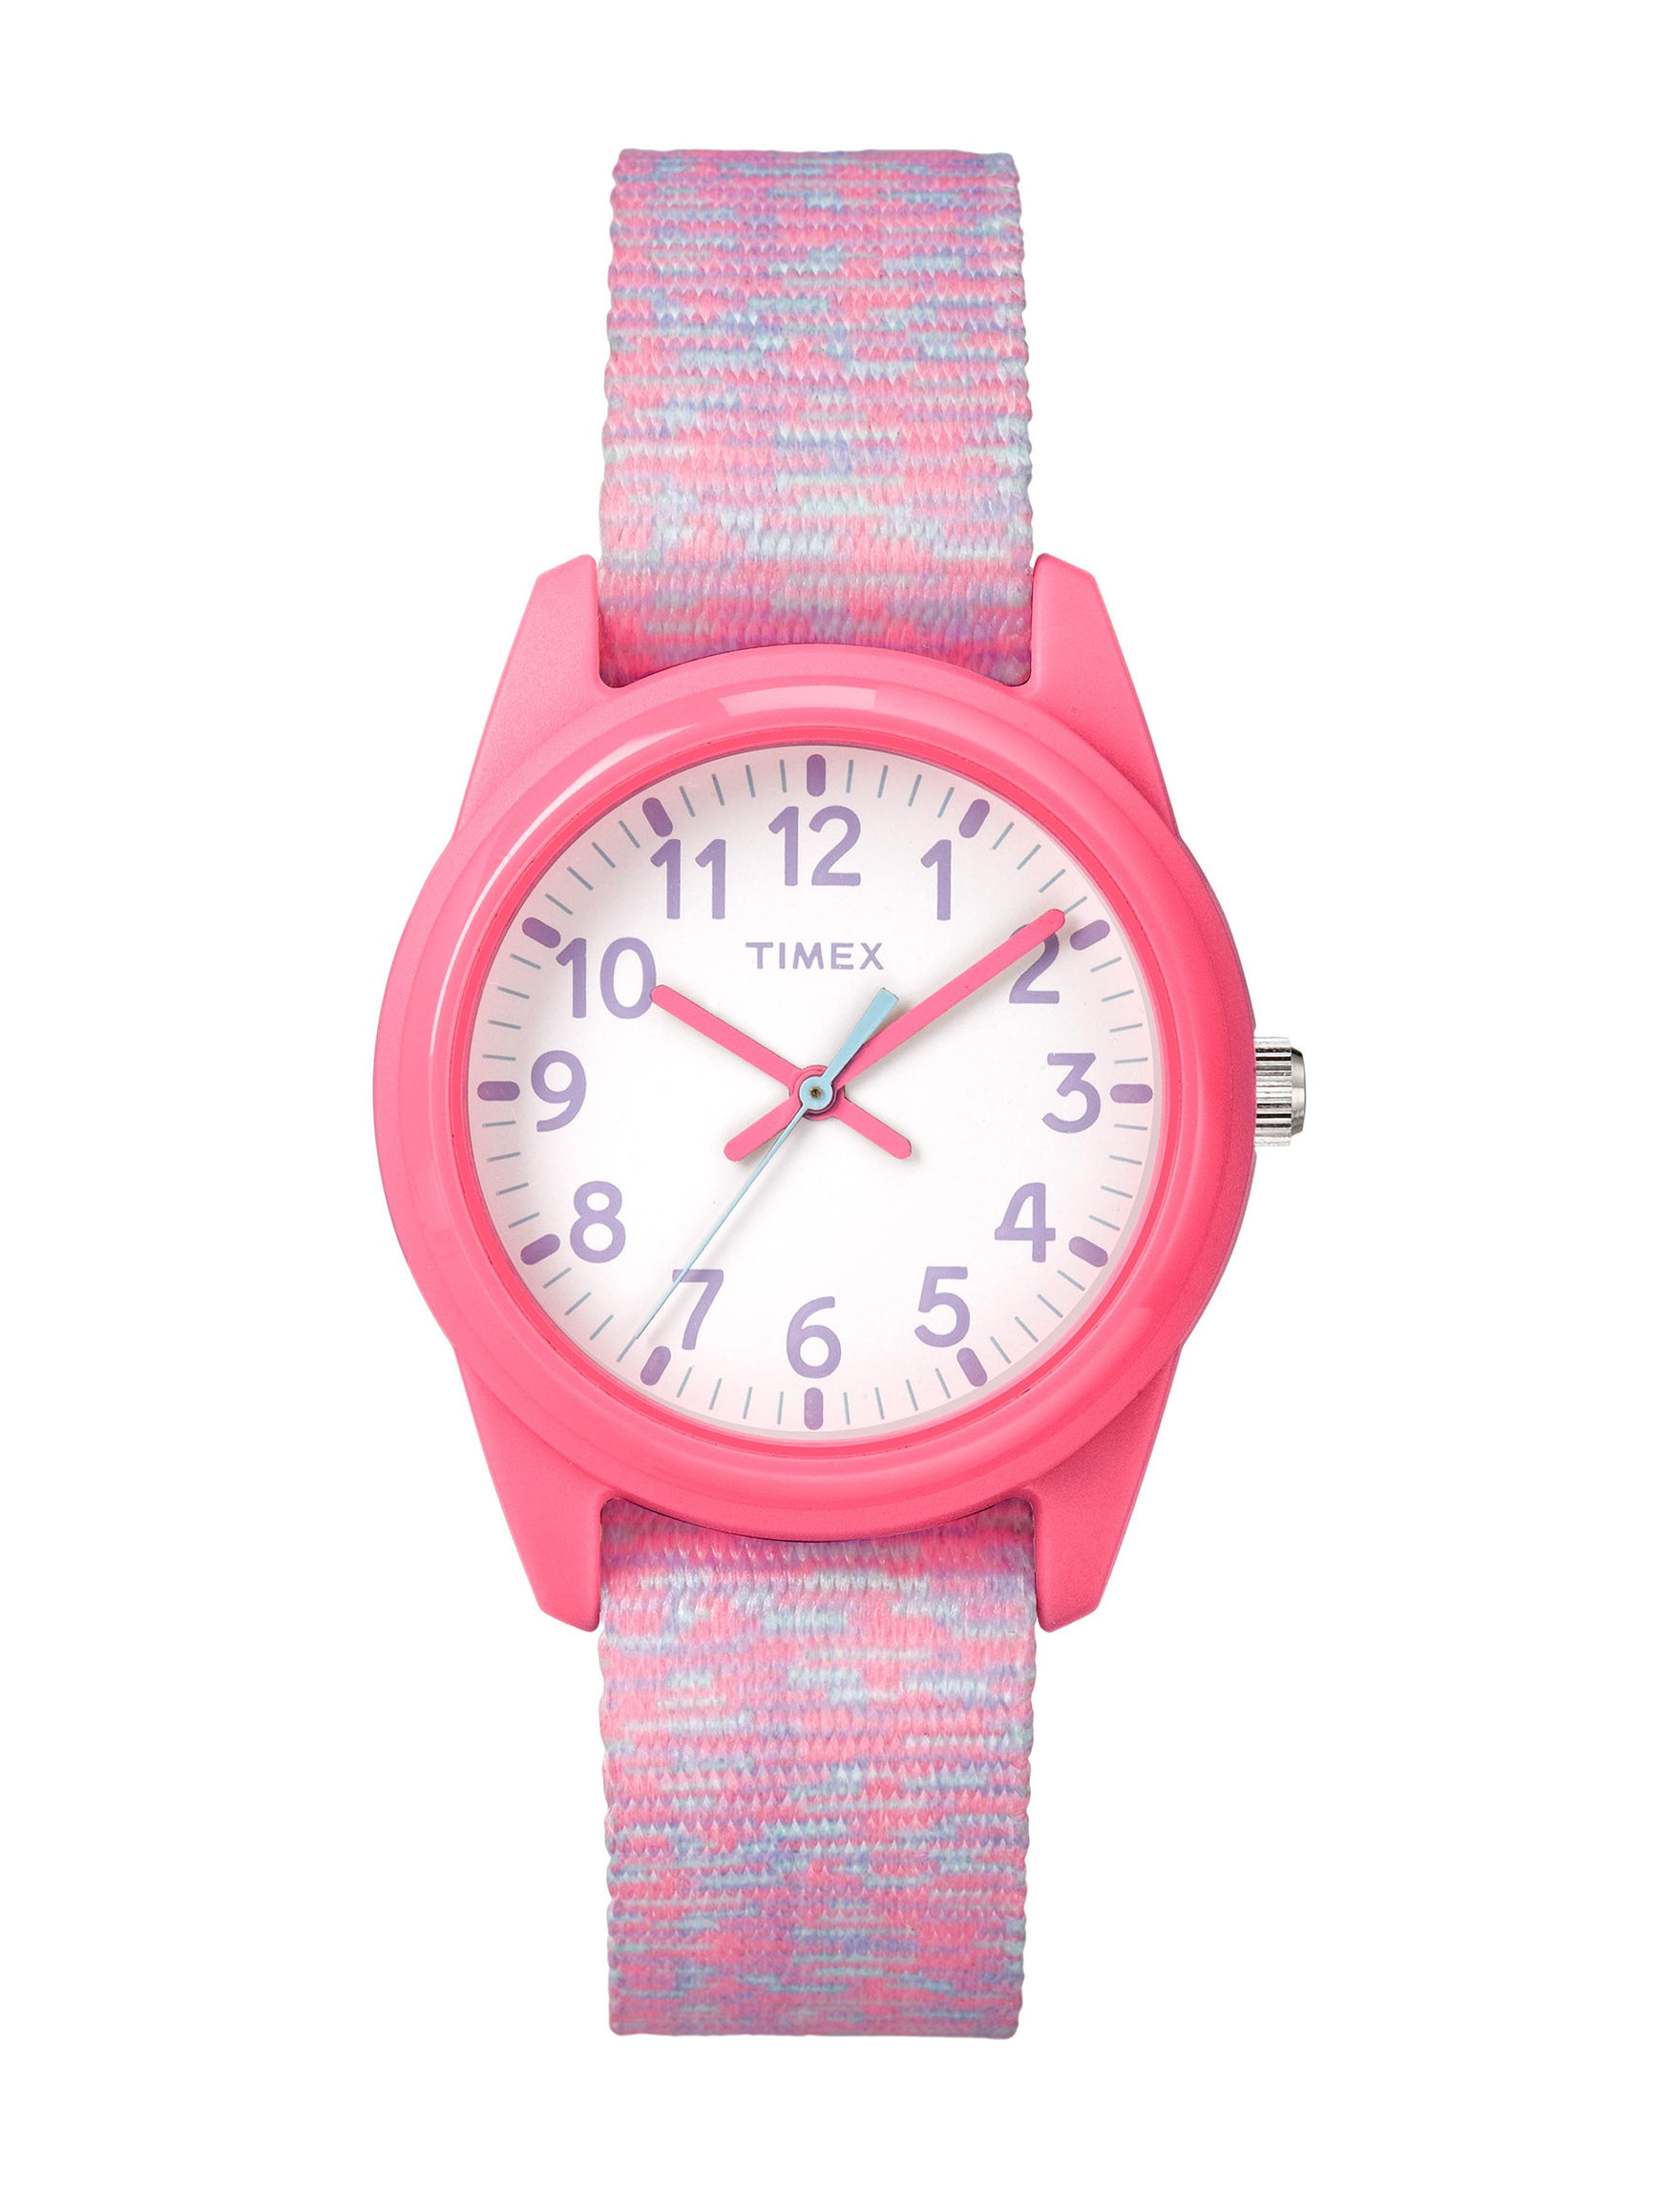 Timex Pink Fashion Watches